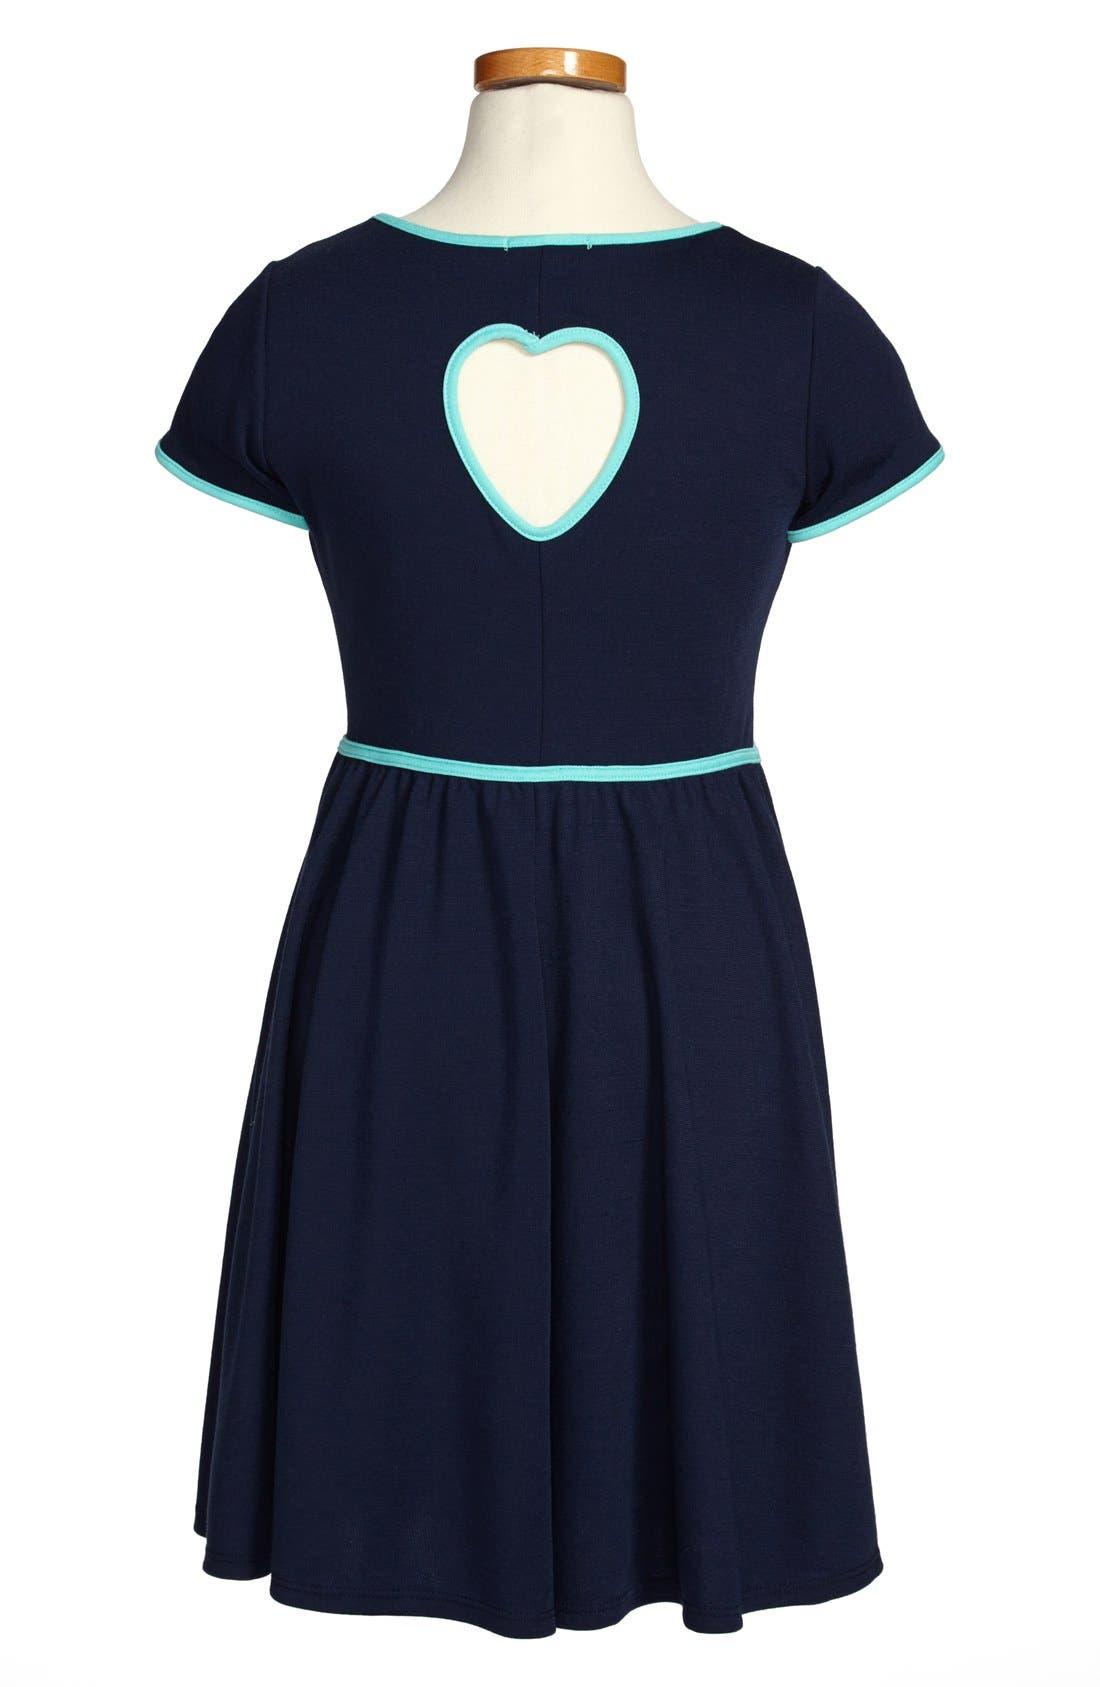 Alternate Image 2  - Soprano Cap Sleeve Knit Dress (Big Girls)